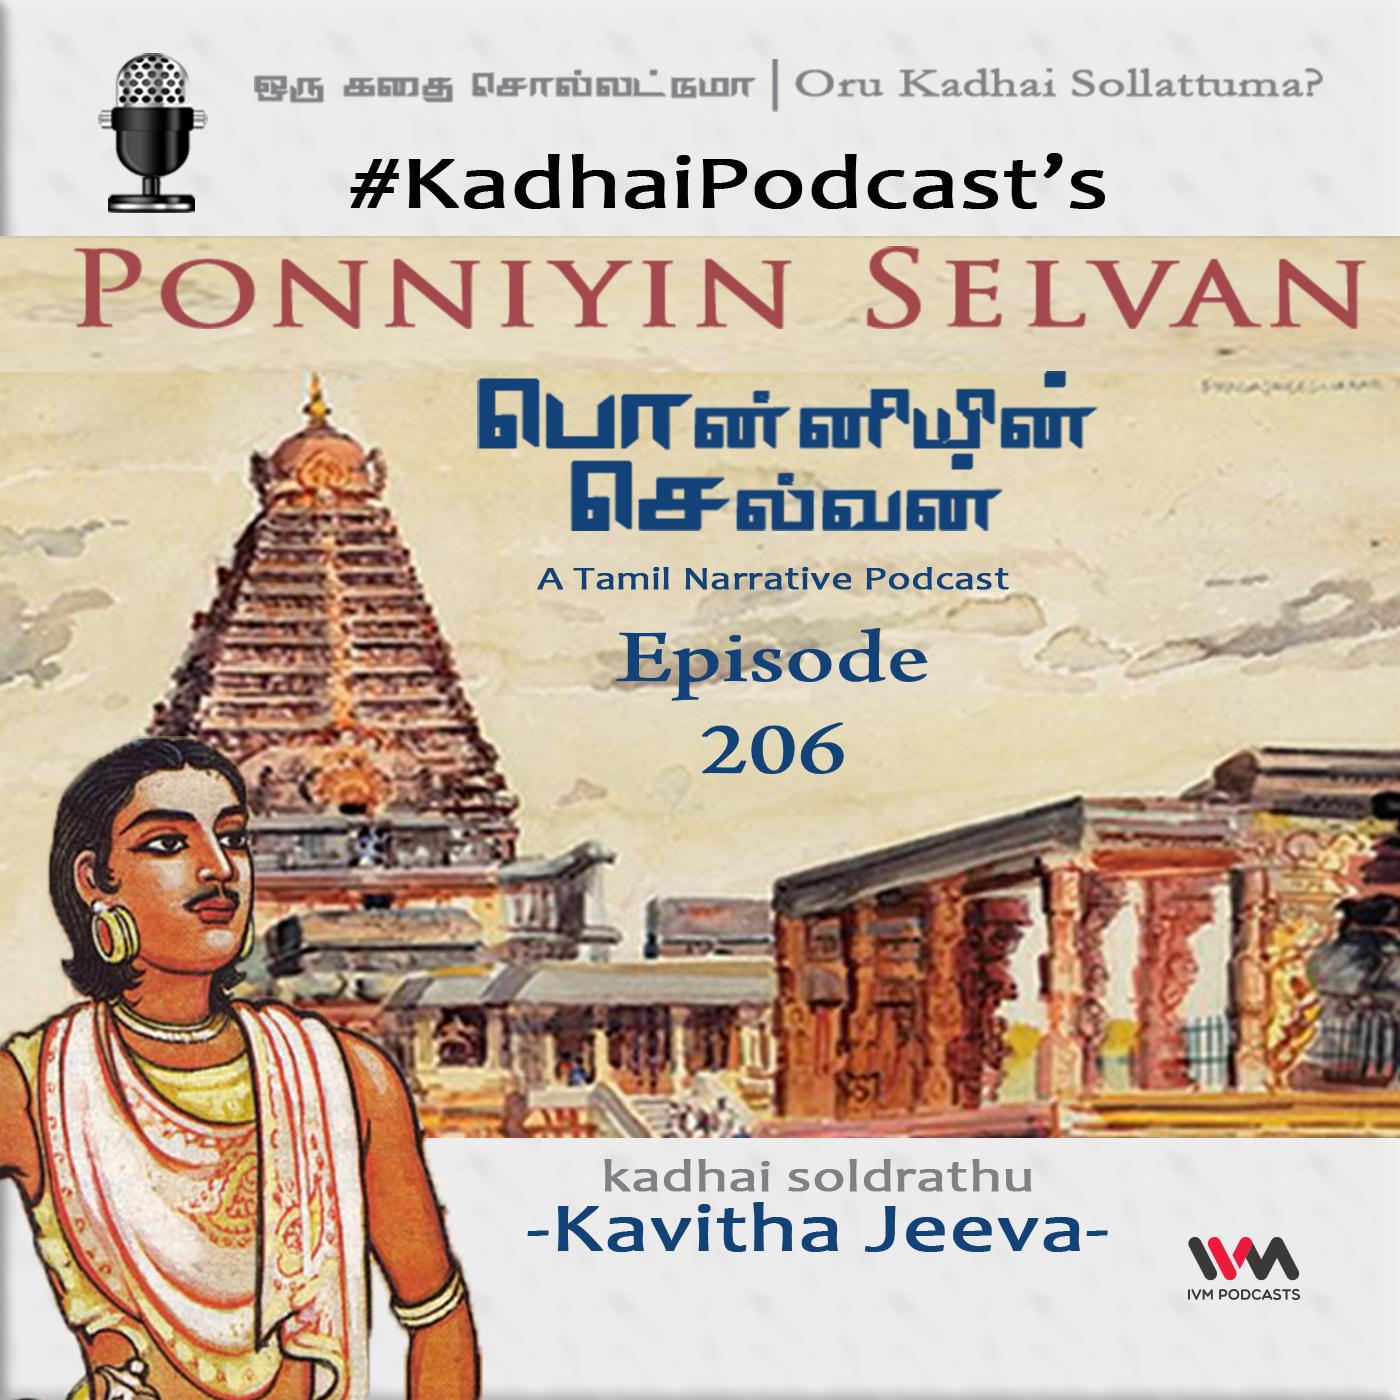 KadhaiPodcast's Ponniyin Selvan - Episode # 206